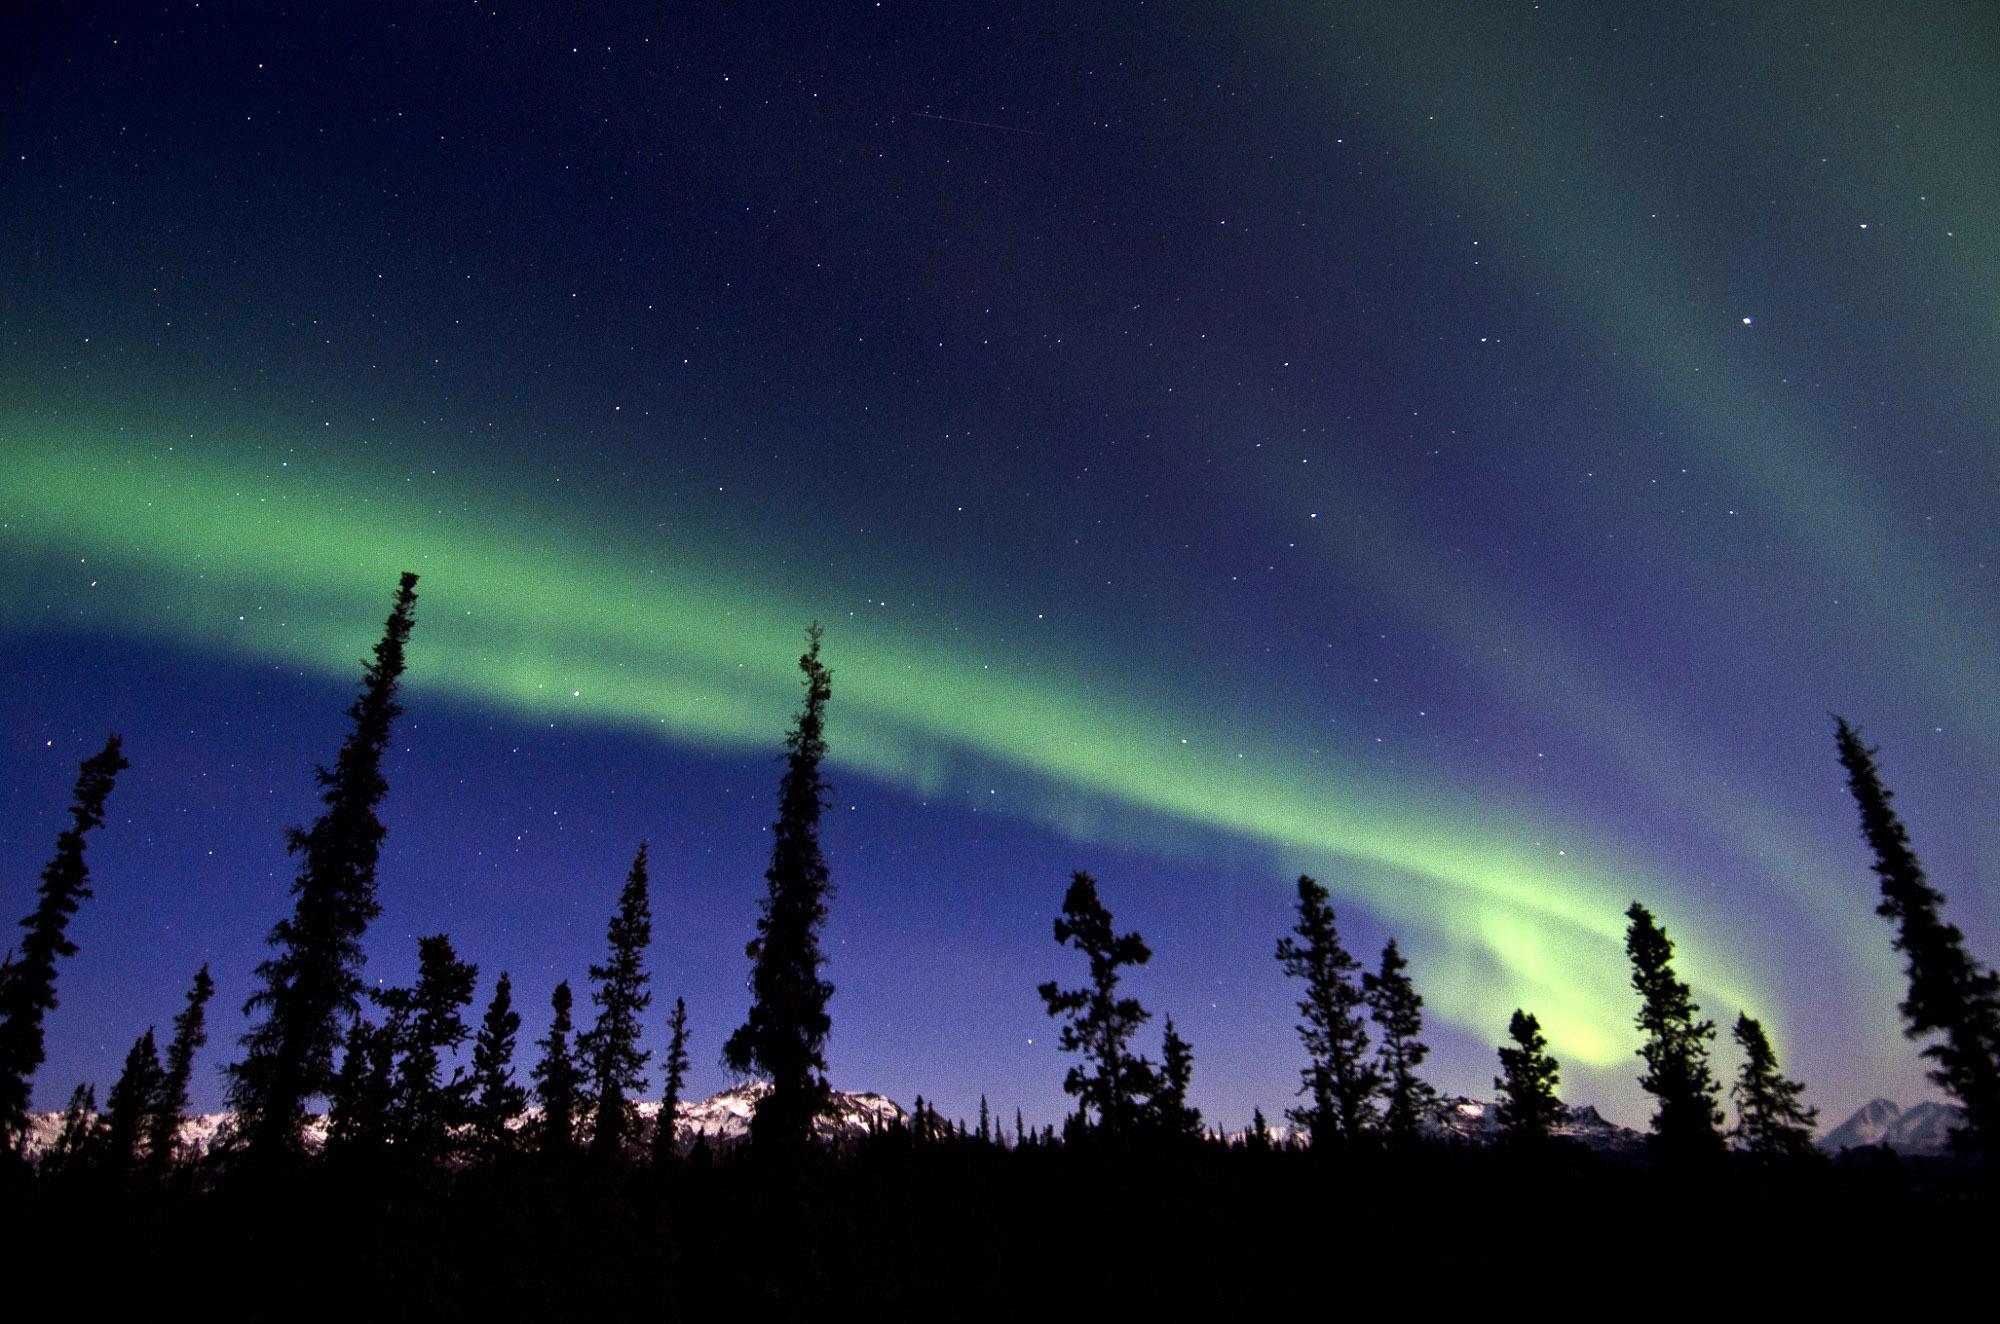 Alaska Corporation Search >> Aurora Borealis in Denali National Park, Alaska image - Free stock photo - Public Domain photo ...